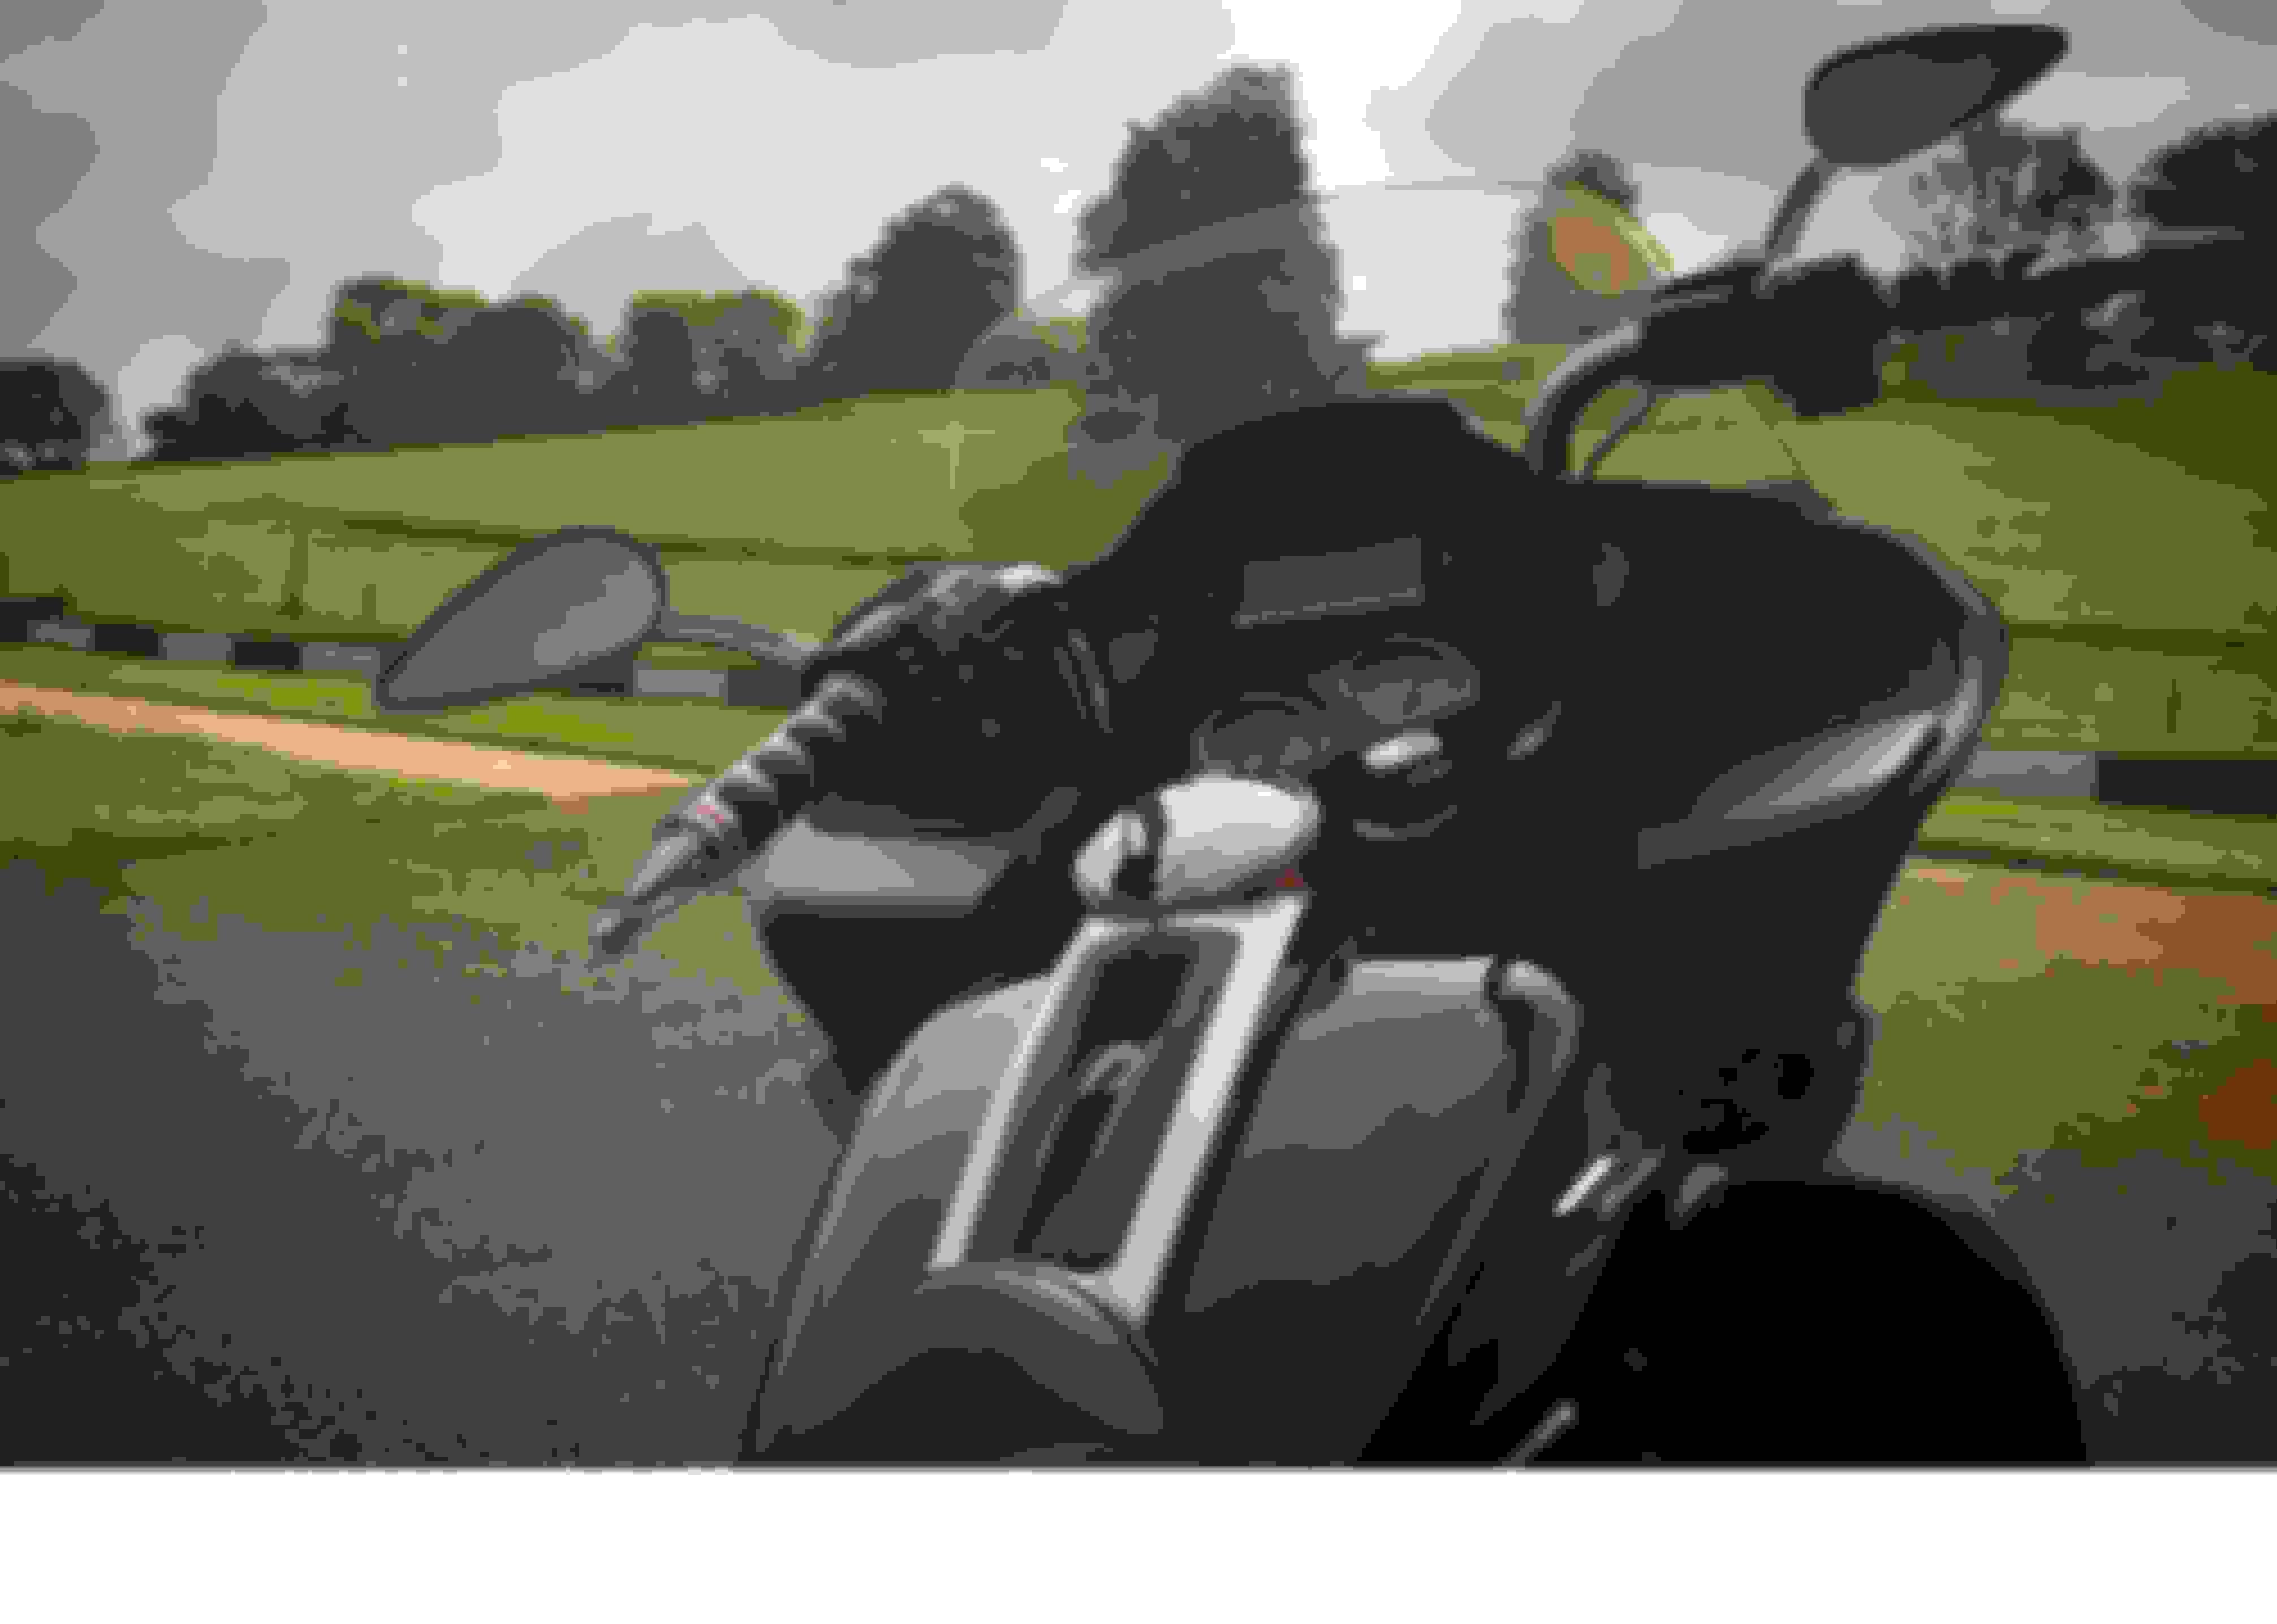 Harley Davidson & Custom Bike Display